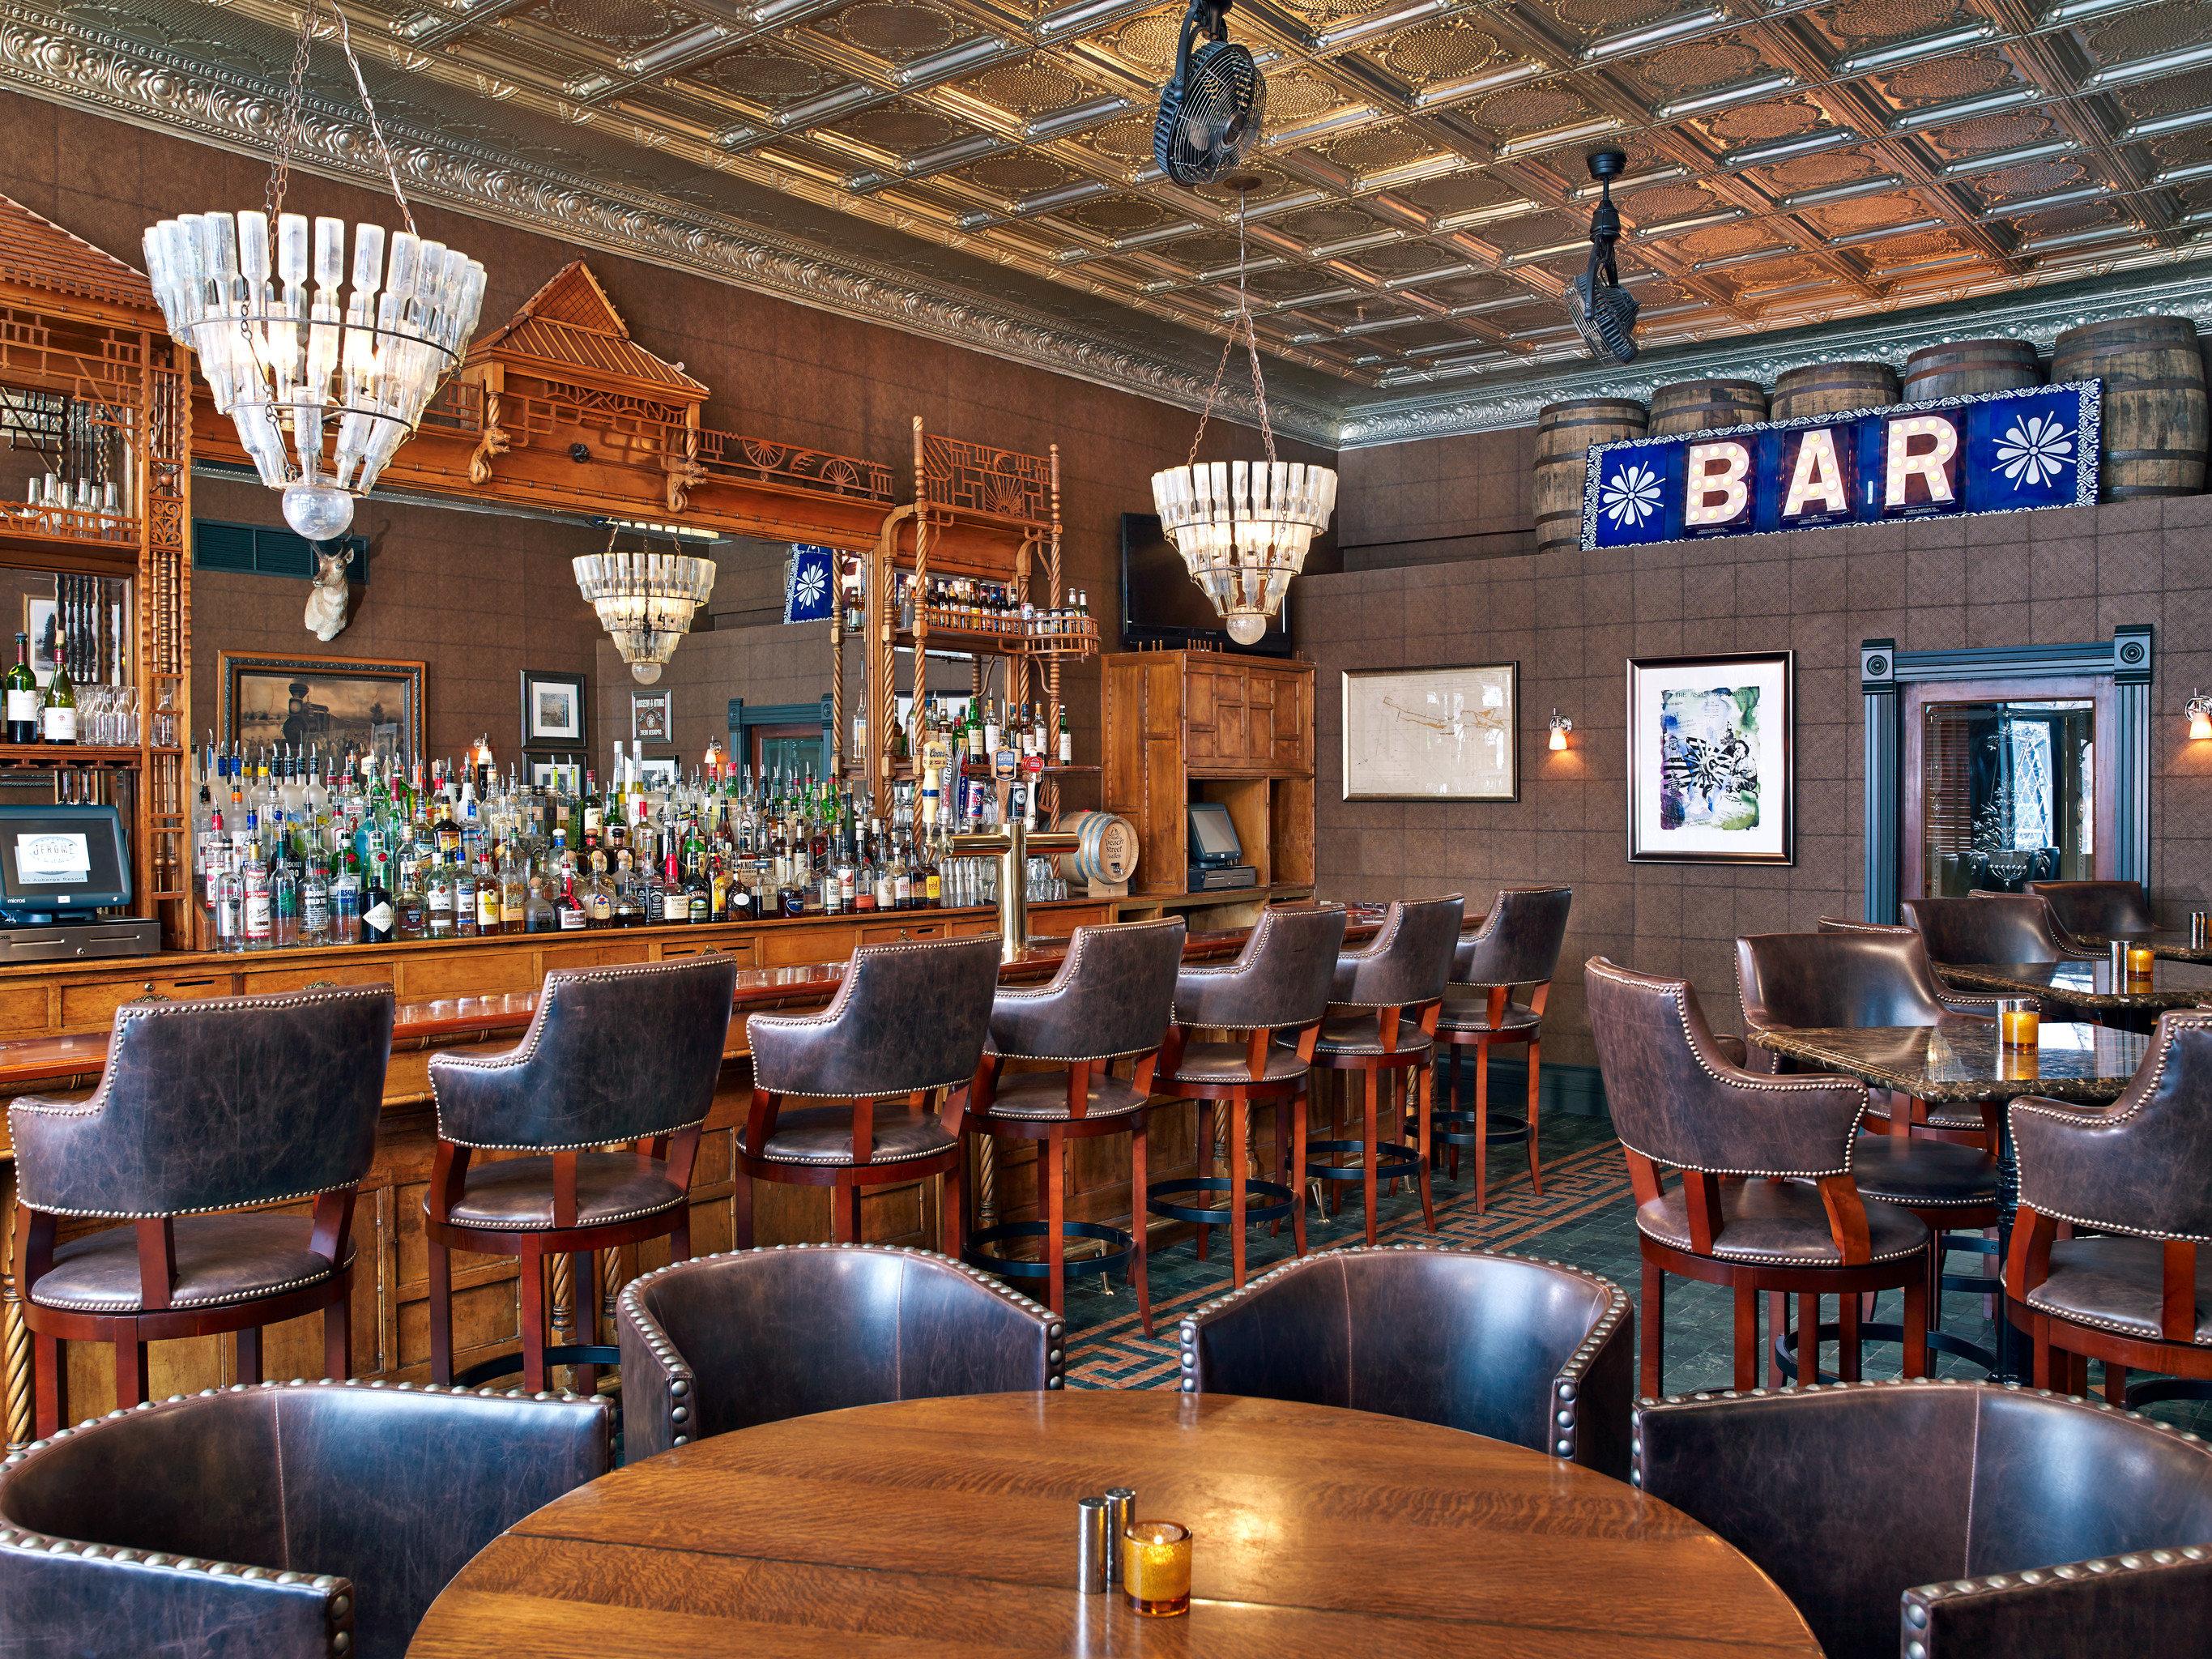 Bar Drink Rustic chair building restaurant café Dining function hall